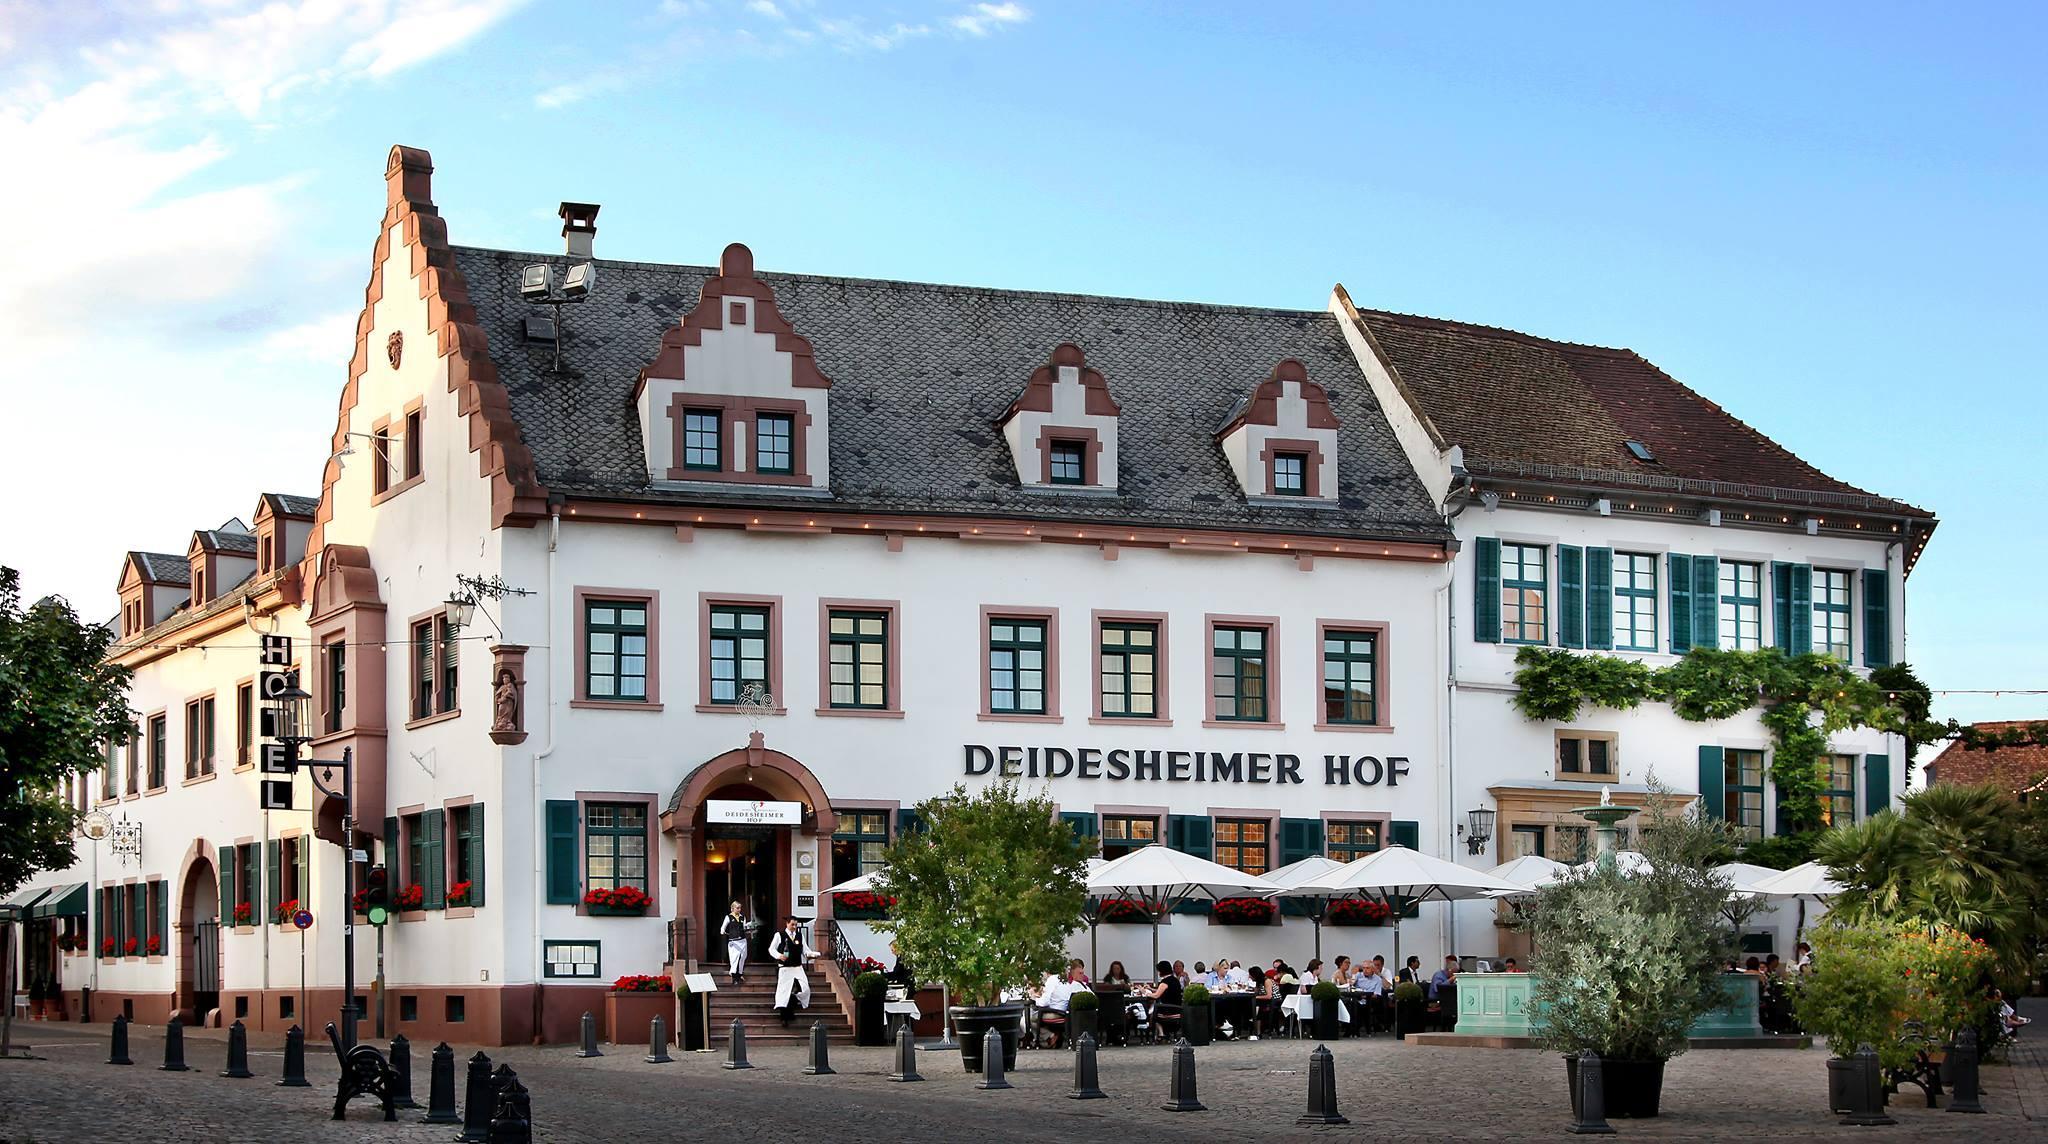 Deidesheimer Hof in Deidesheim